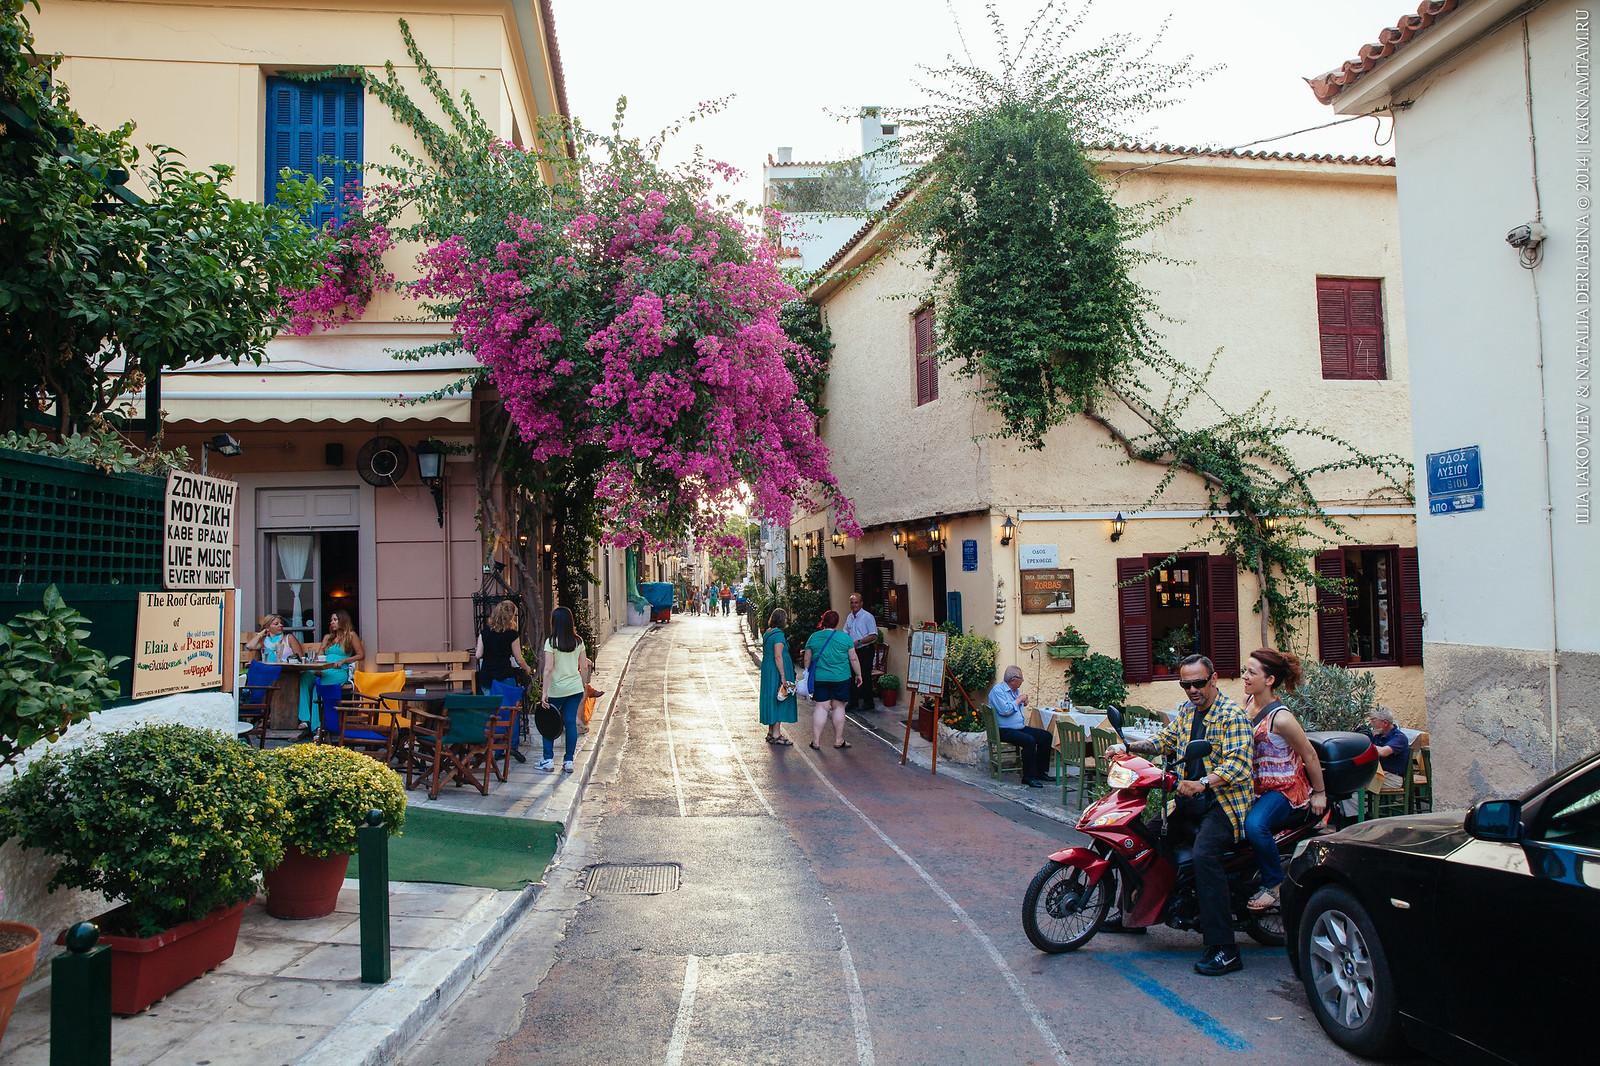 20140618-403-Athens.jpg